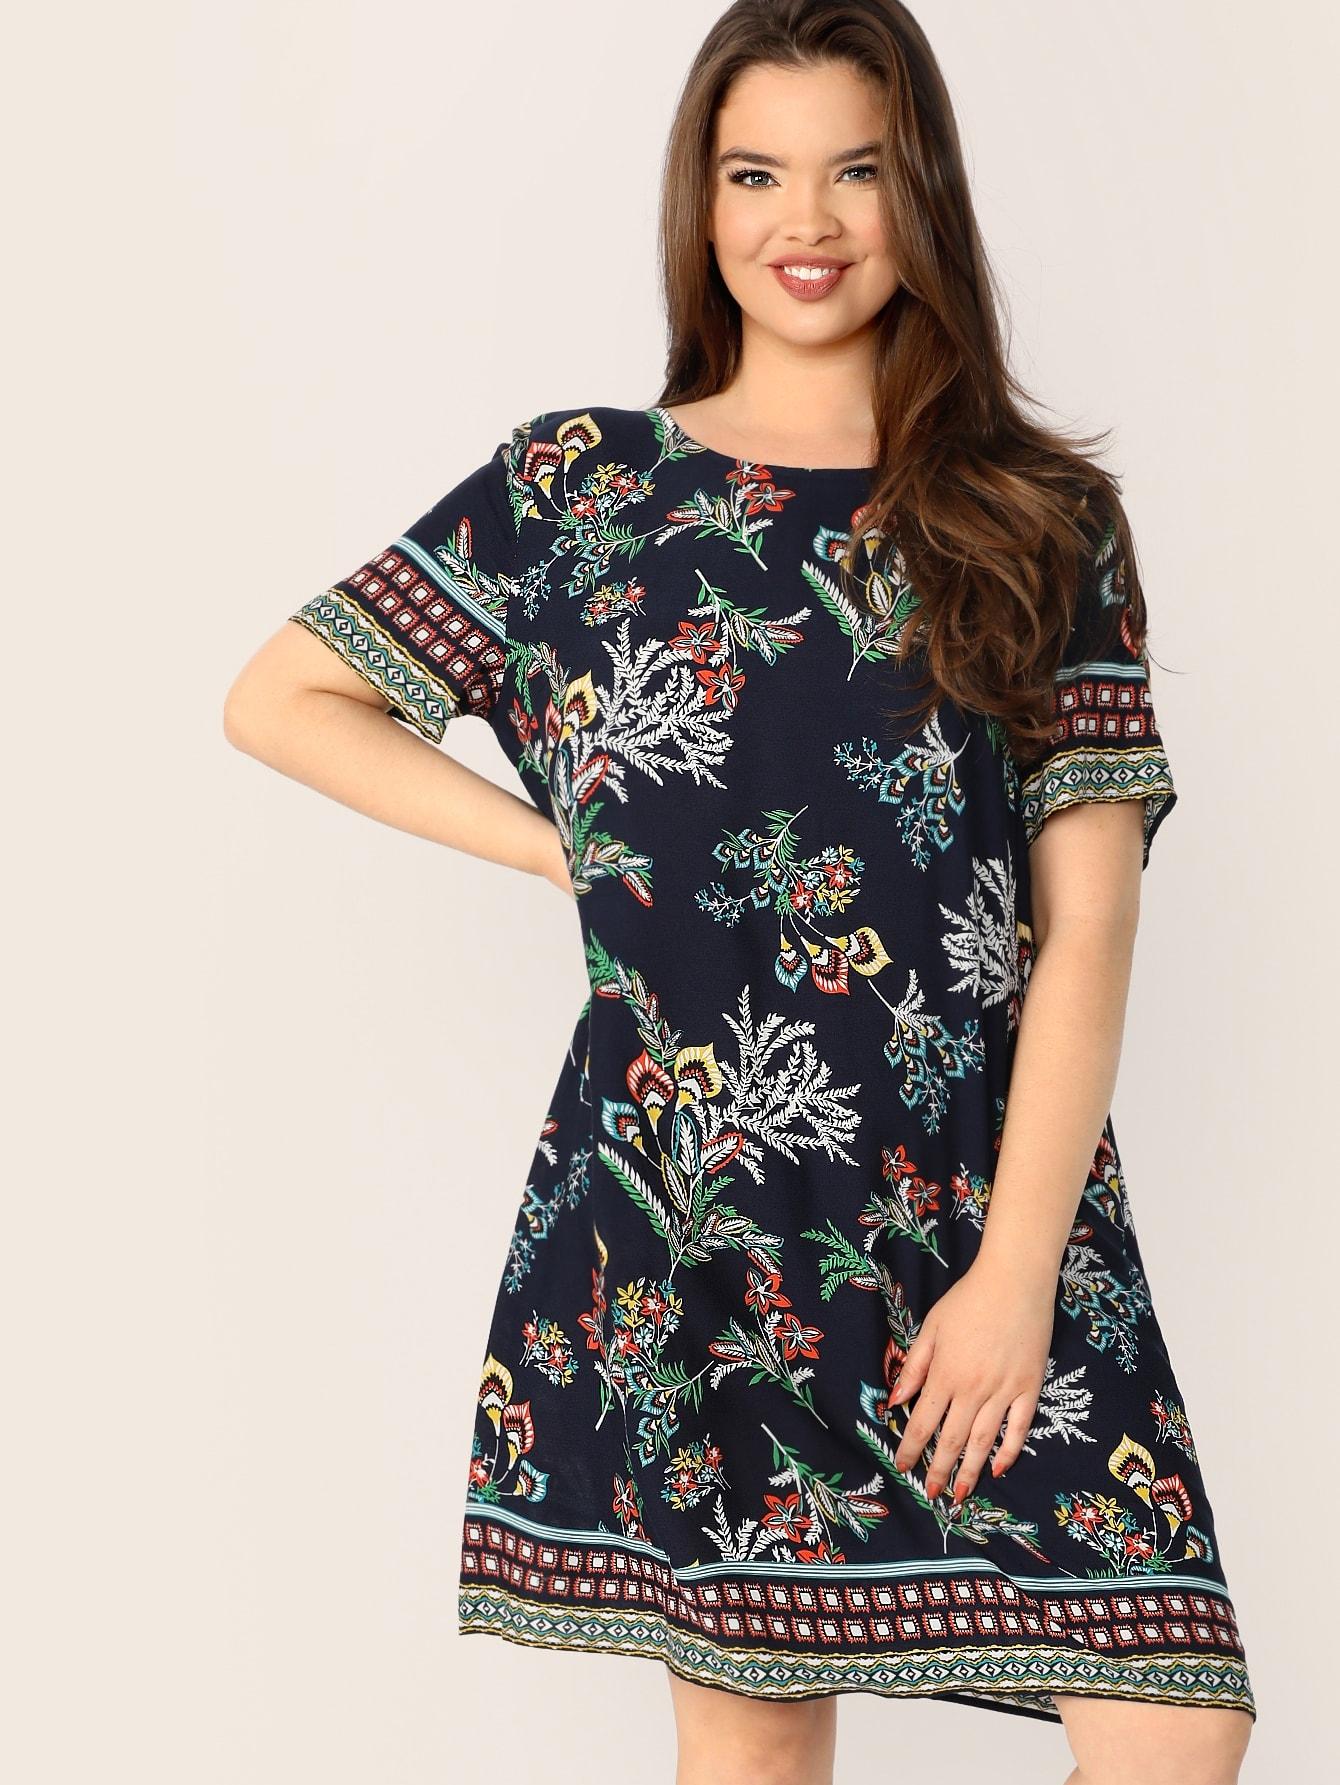 Фото - Размер плюс платье с принтом от SheIn цвет тёмно-синие